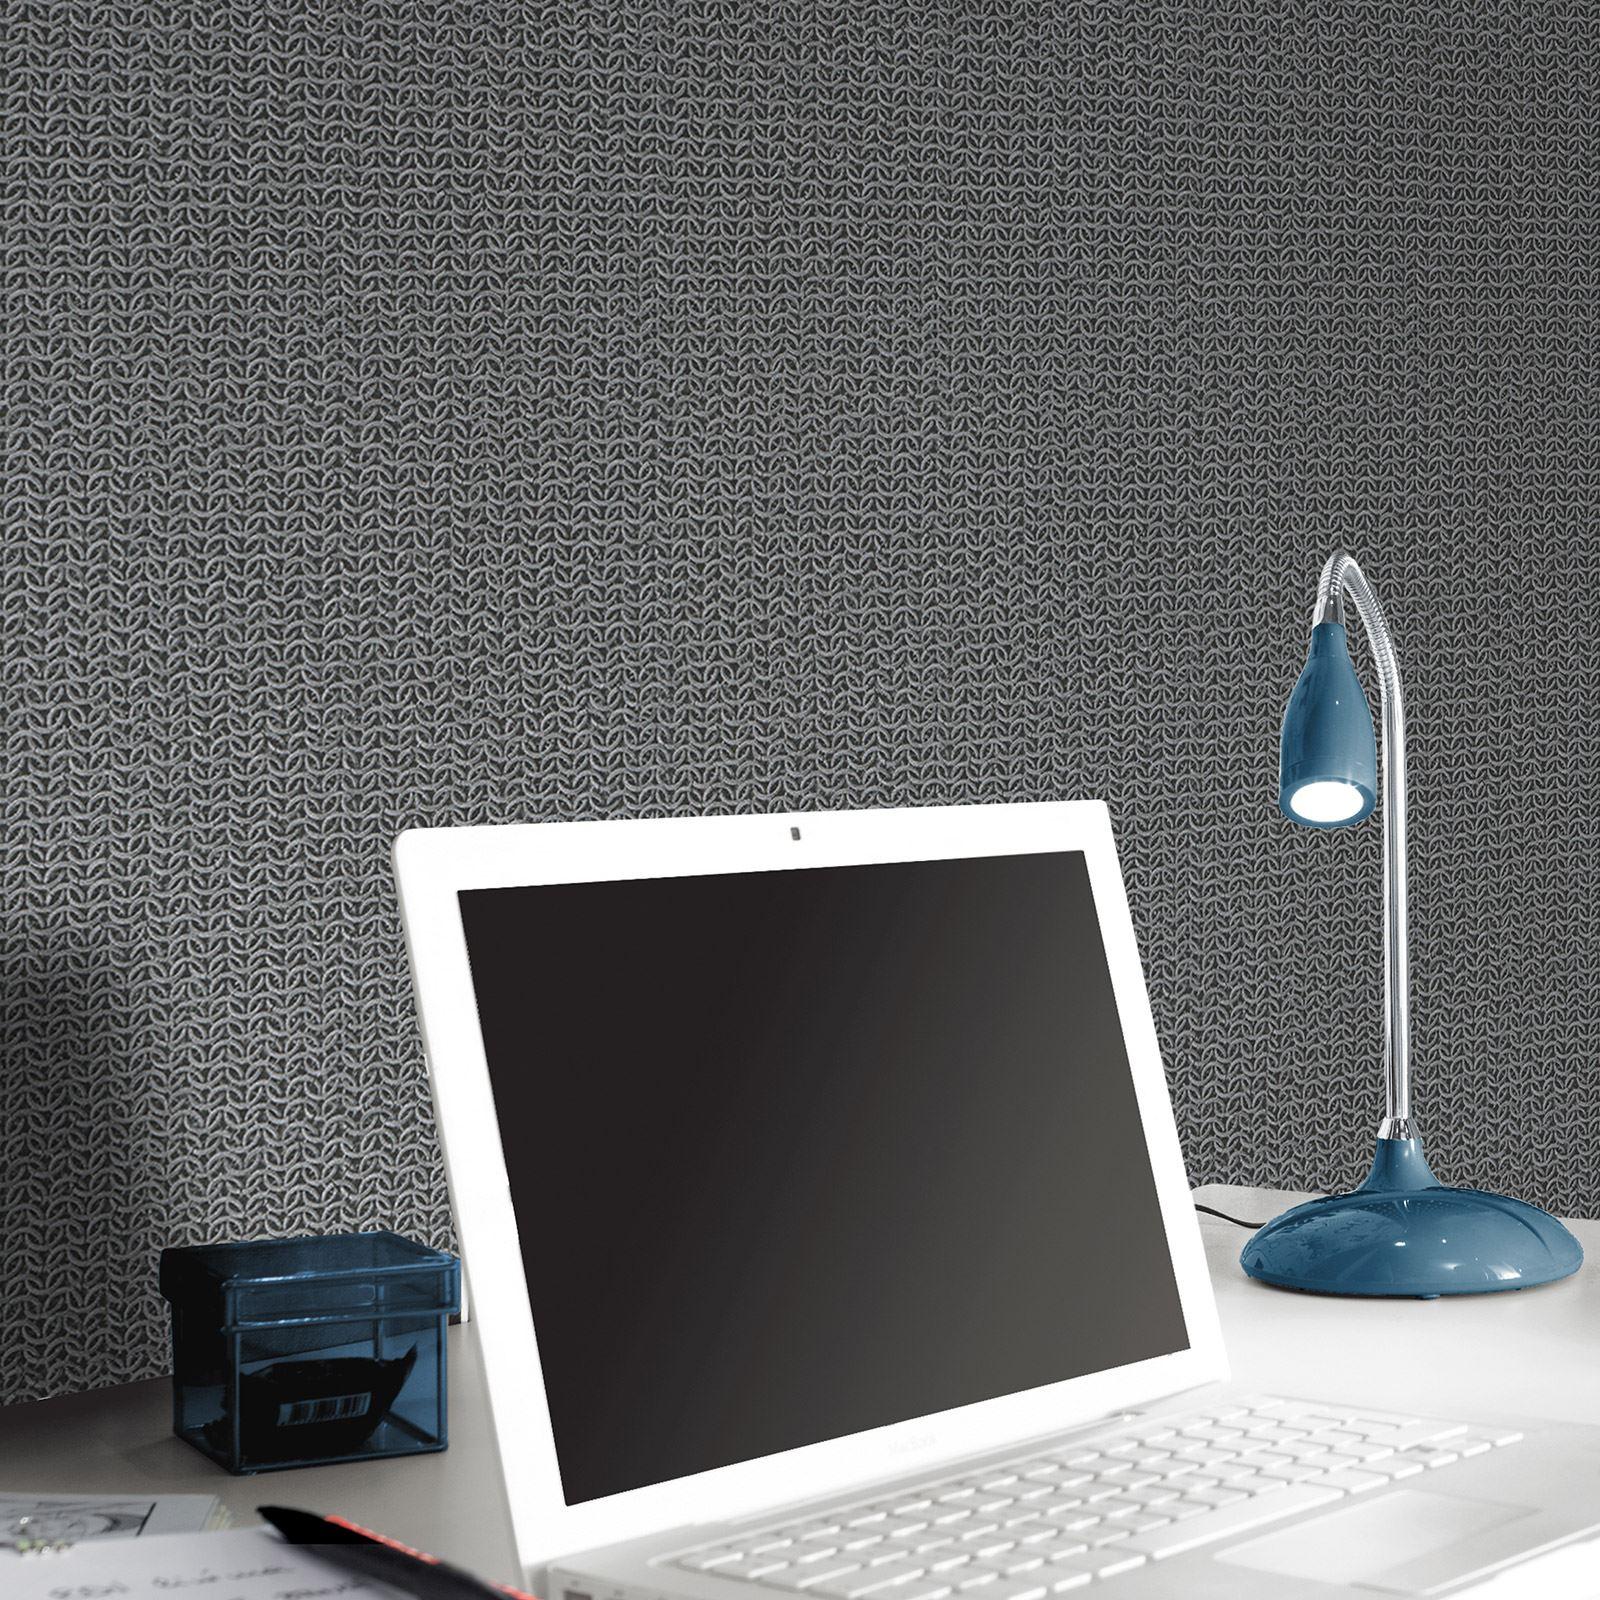 grau silber tapete gemustert sterne blumenmuster federn b ume marmor tafel ebay. Black Bedroom Furniture Sets. Home Design Ideas